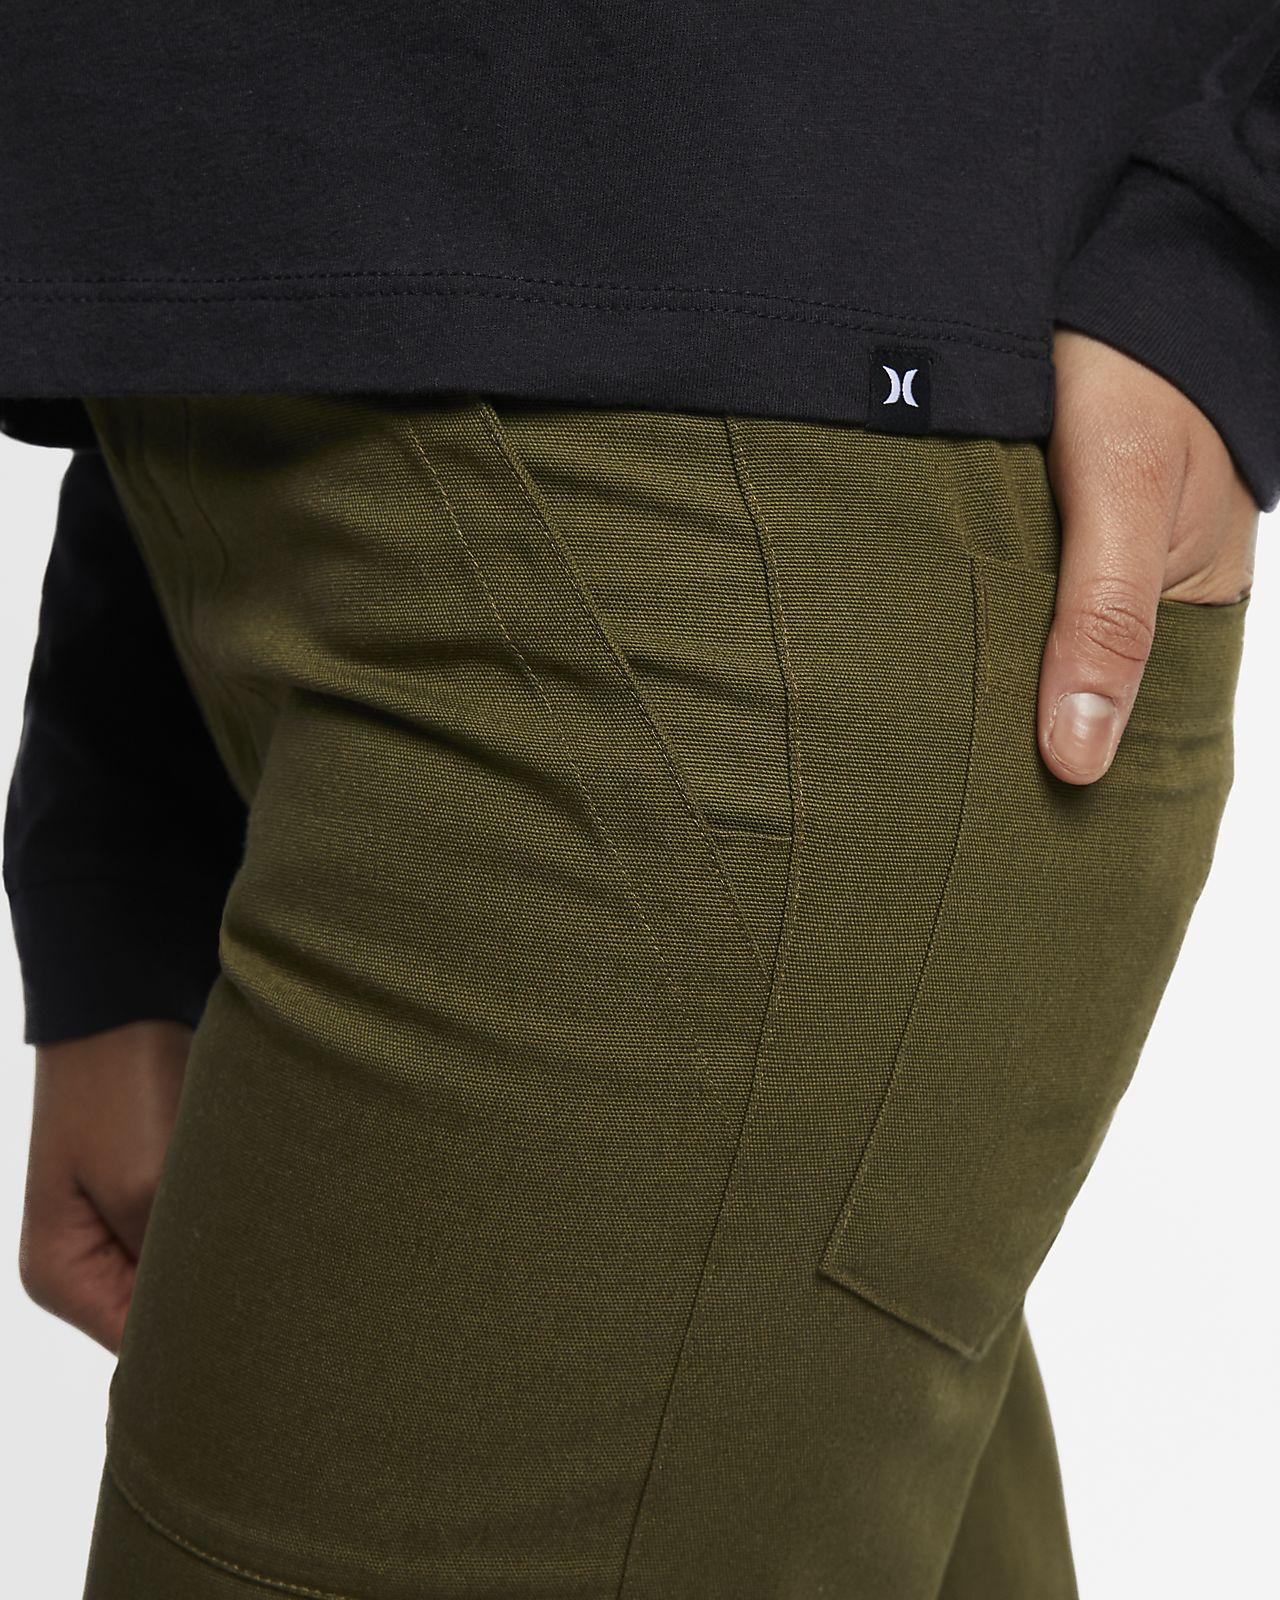 d0e6bd87 Hurley Horizon Perfect langermet T-skjorte til dame. Nike.com NO